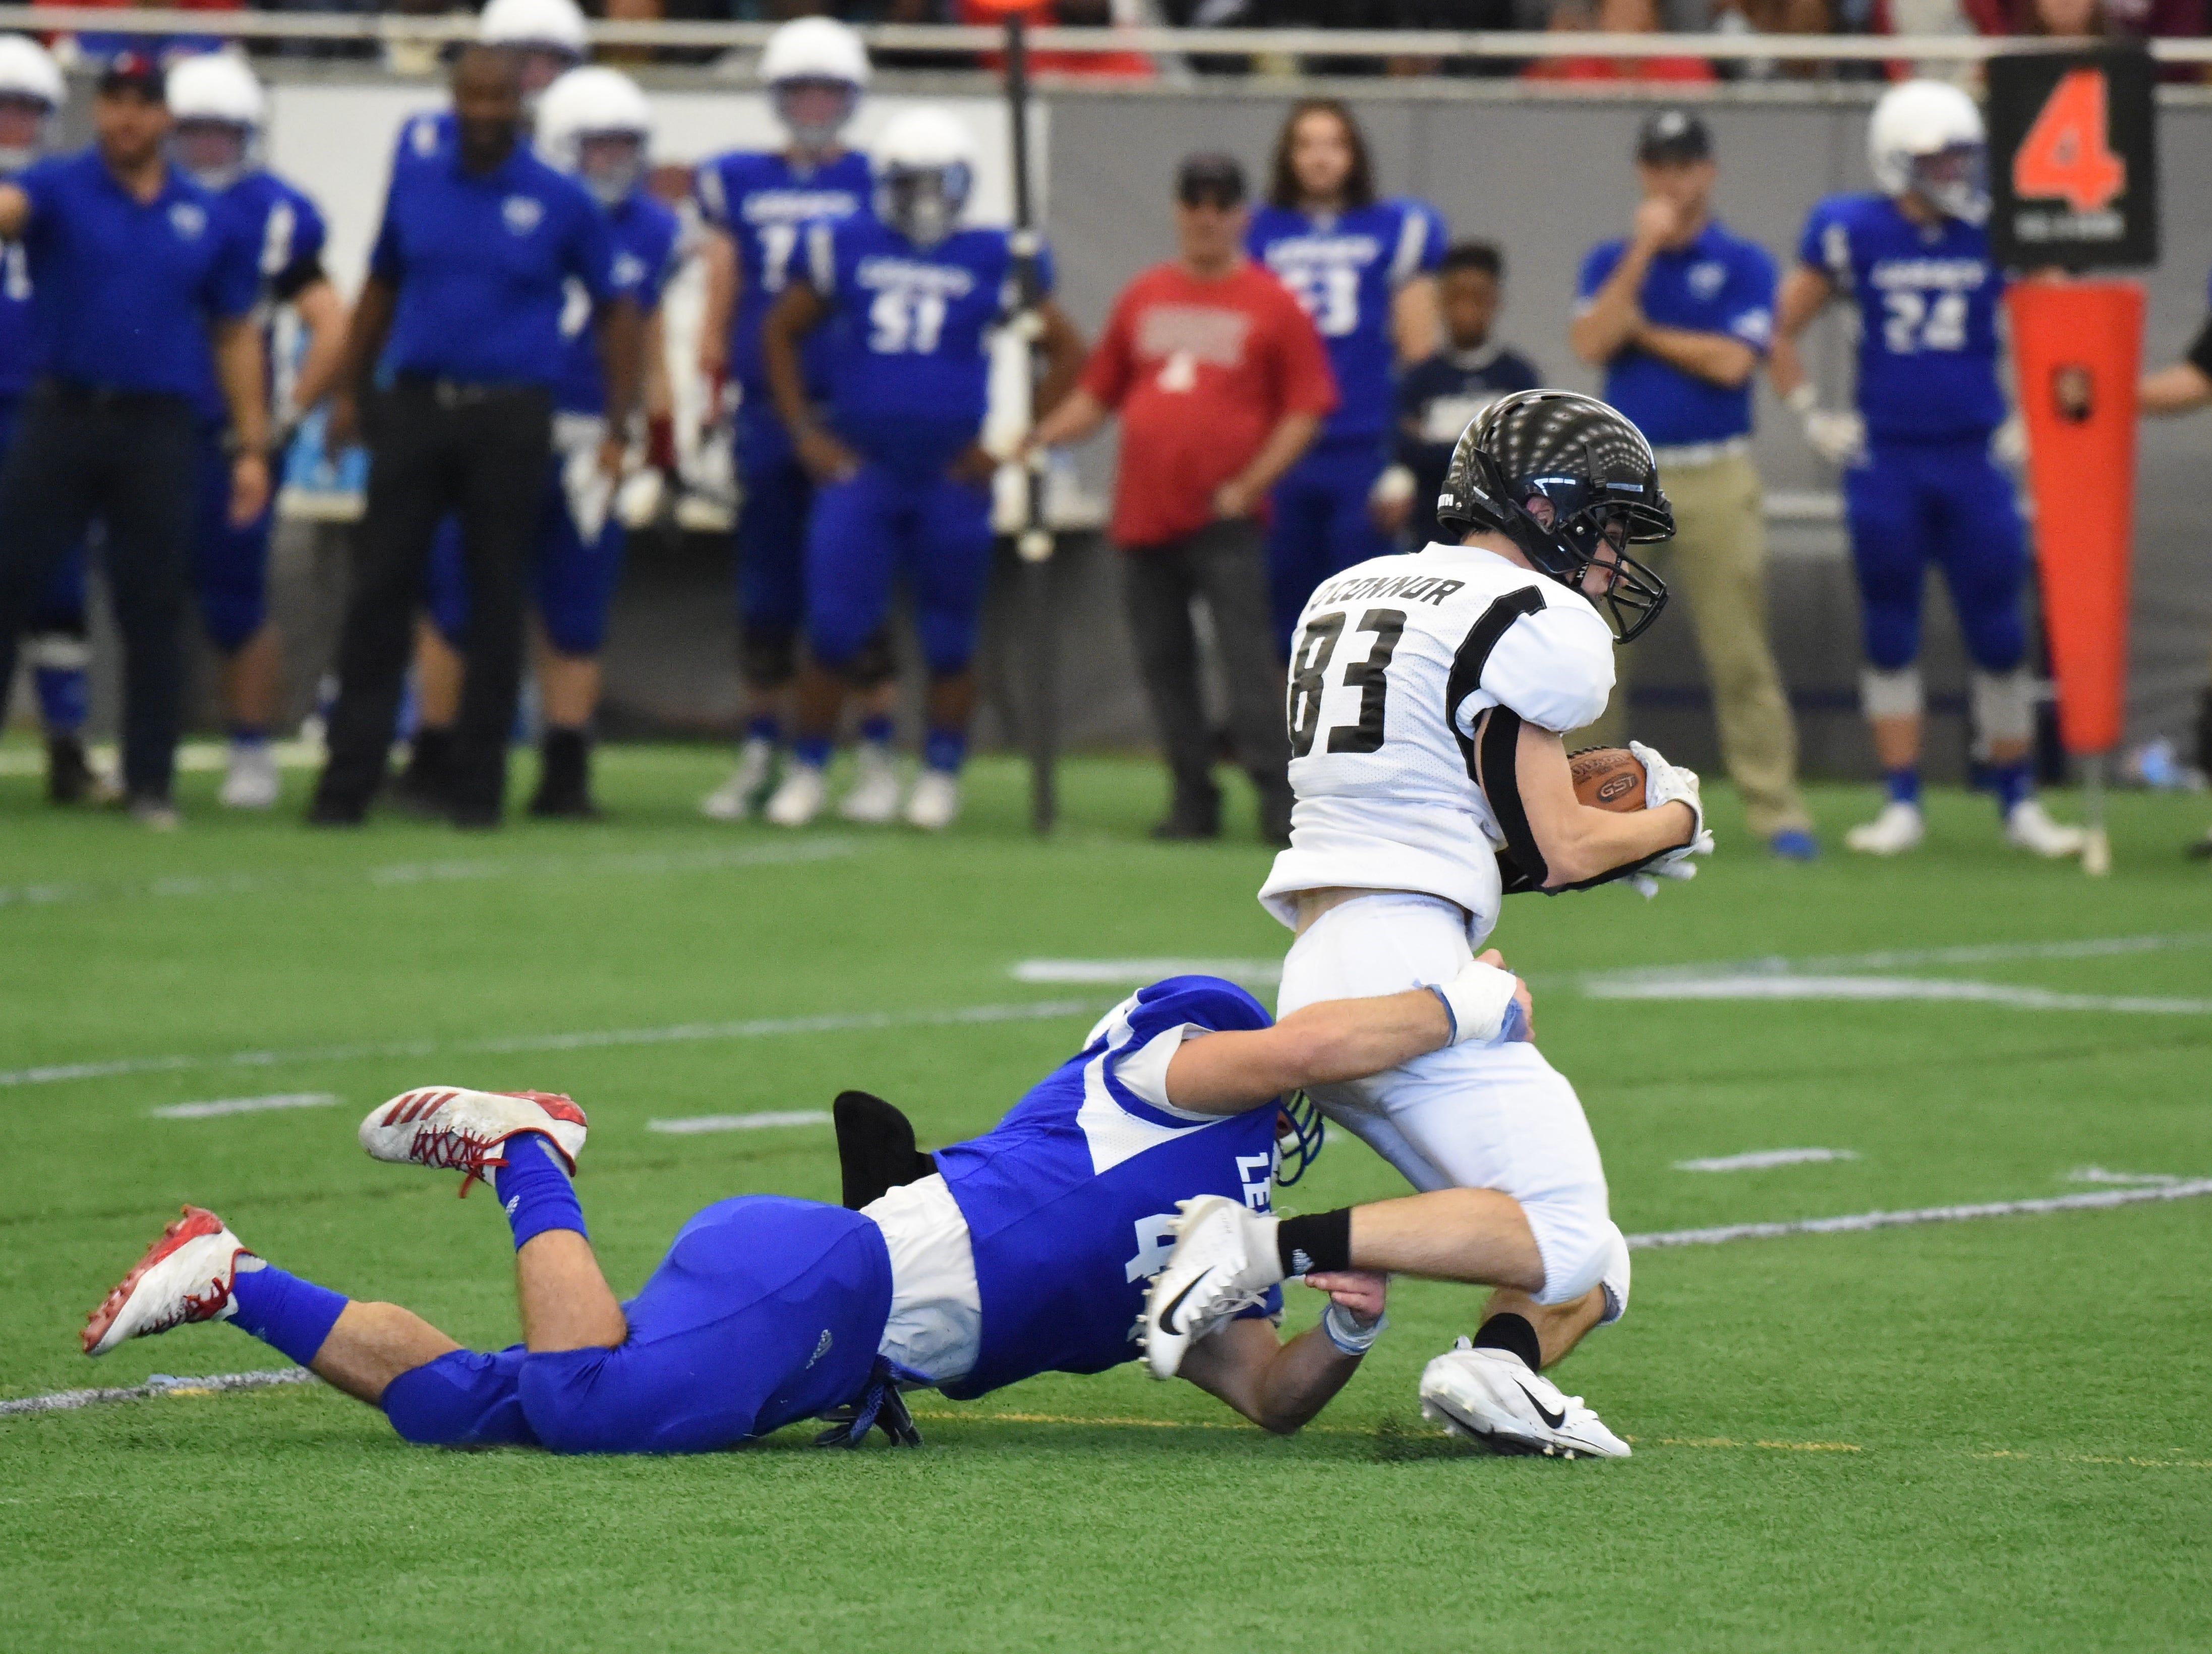 A Team Legacy defender brings down Team Legends wide receiver Drew O'Connor (83), of Novi High School.